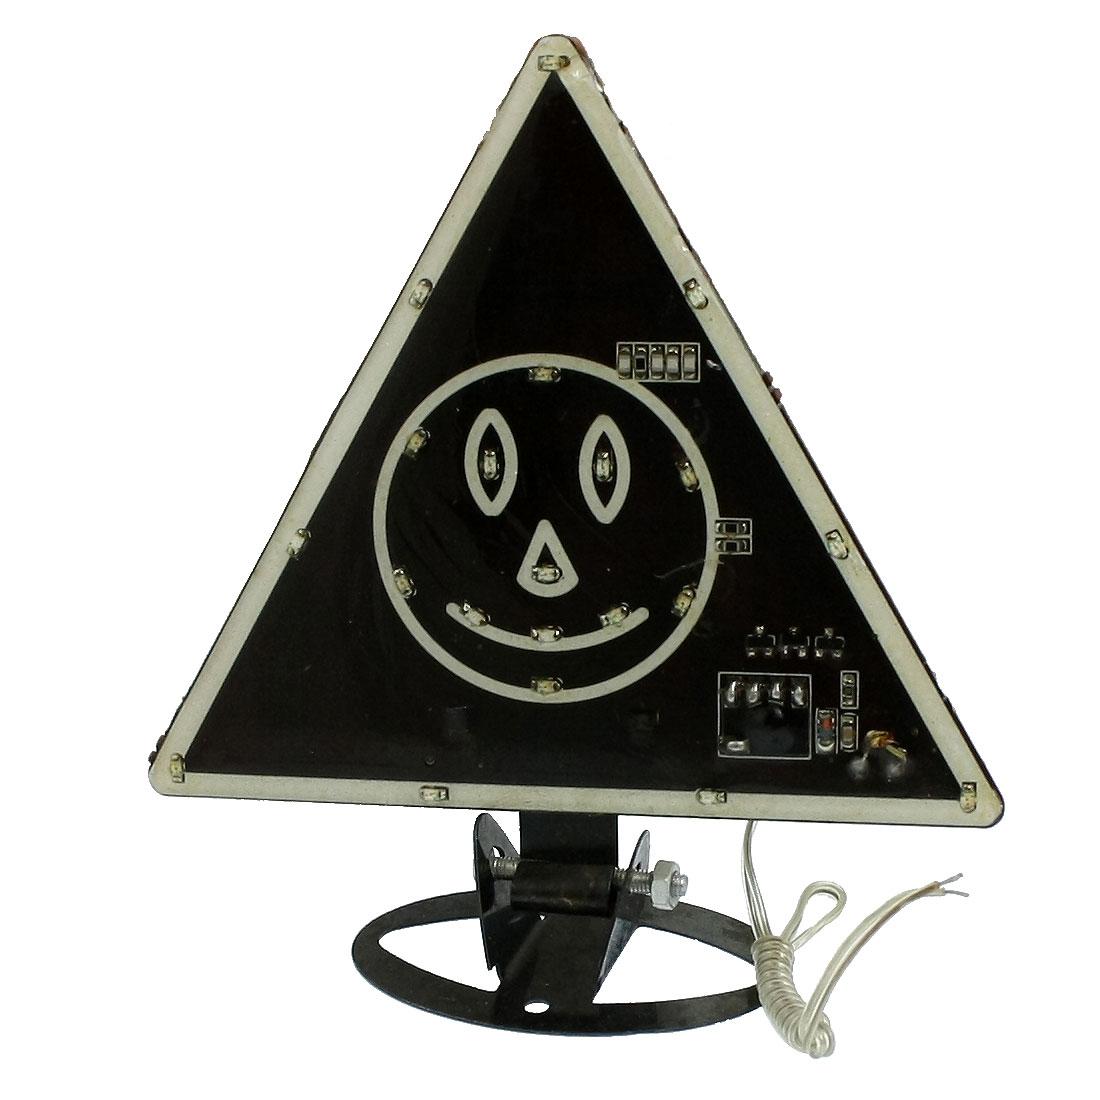 Car Decorative Smiling Face Colorful Flashing Light 21-LED Moga Lamp Black